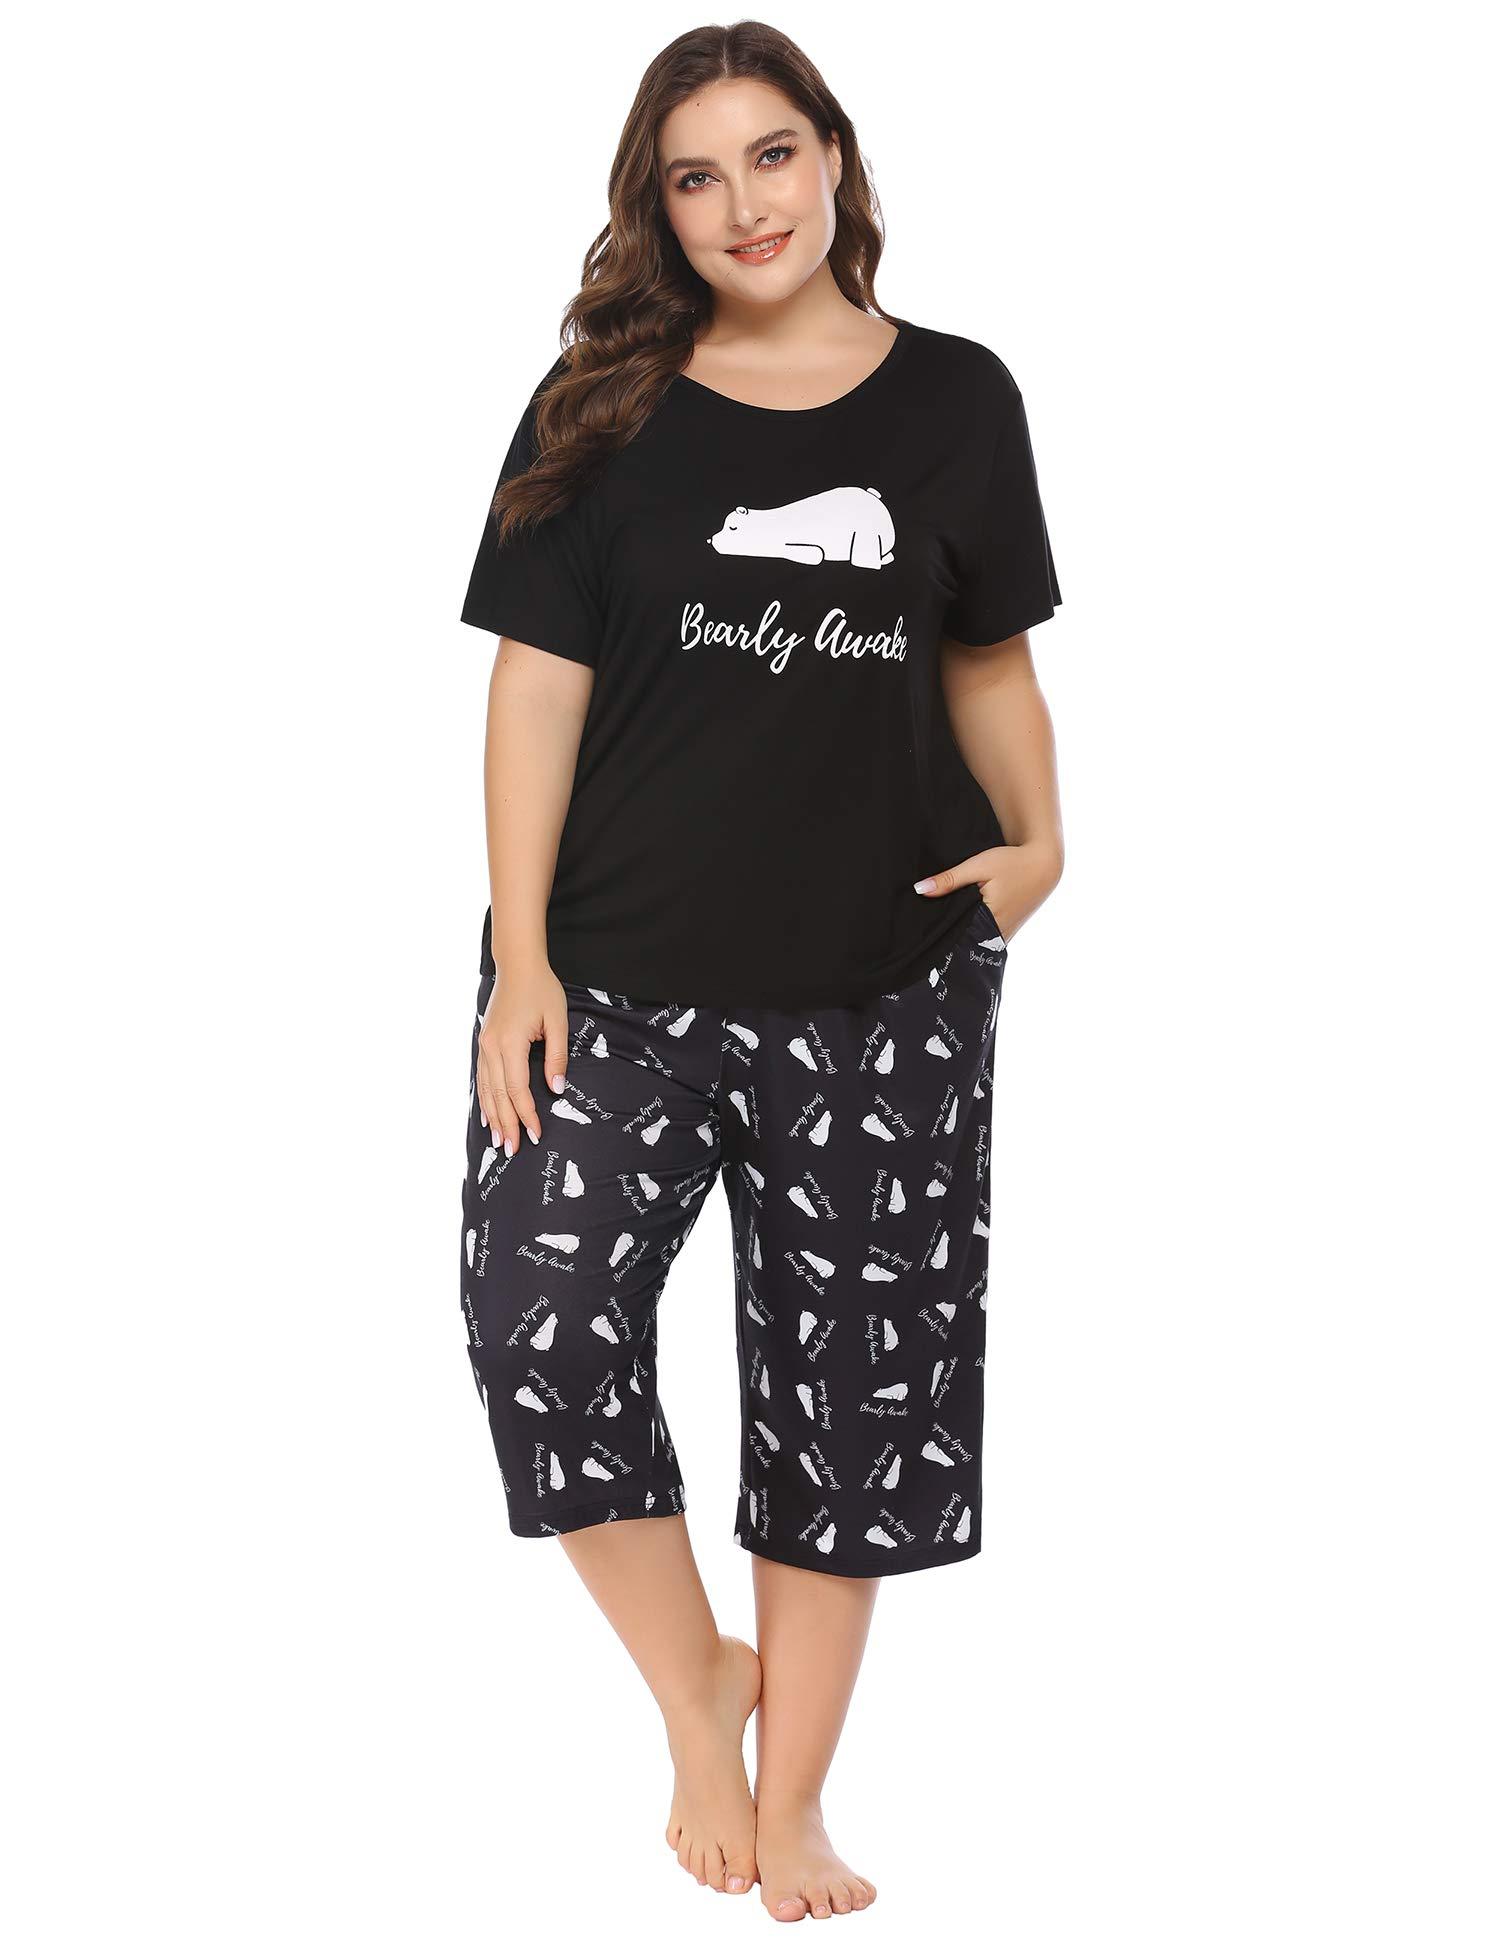 IN'VOLAND Women Plus Size Pajama Set Capri Short Sleeve Sleepwear Sets Print PJ Set with Pockets